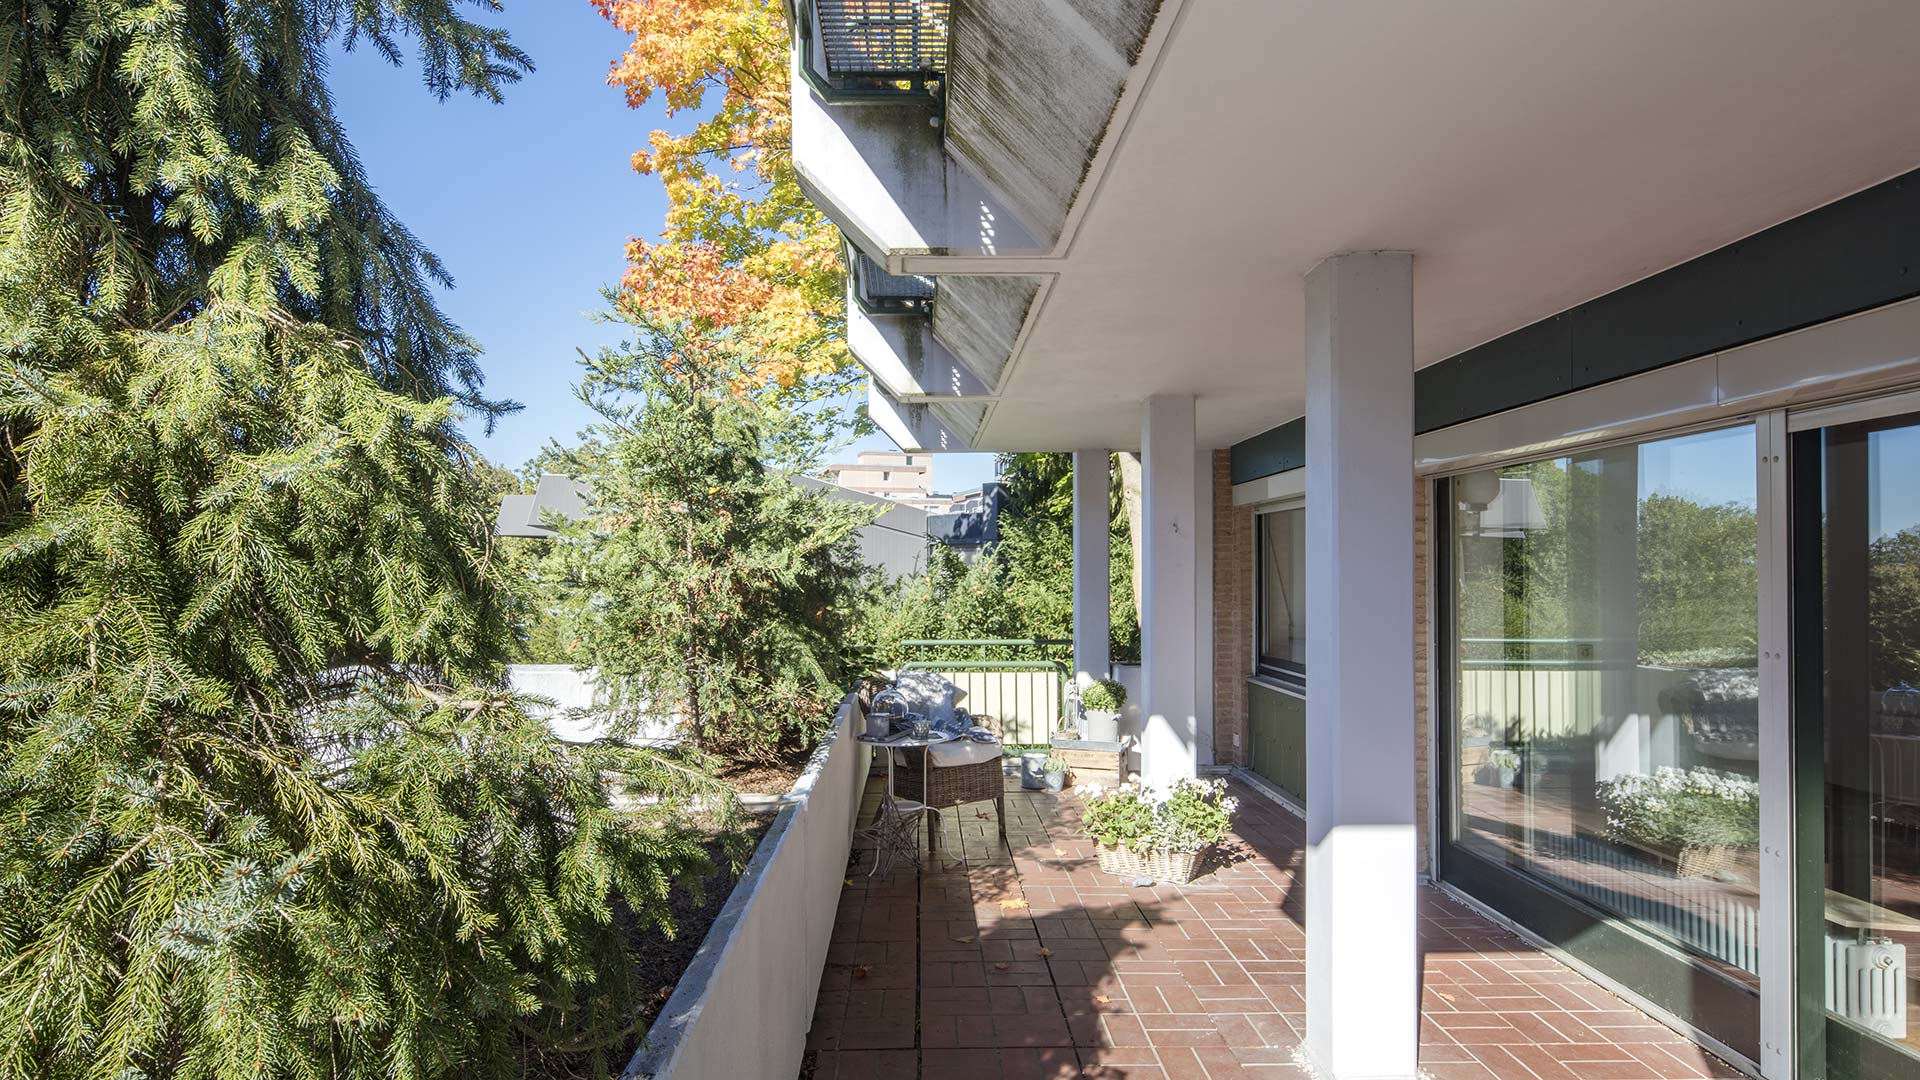 Architekturfotografie: Balkon | Foto: Dieter Eikenberg, imprints